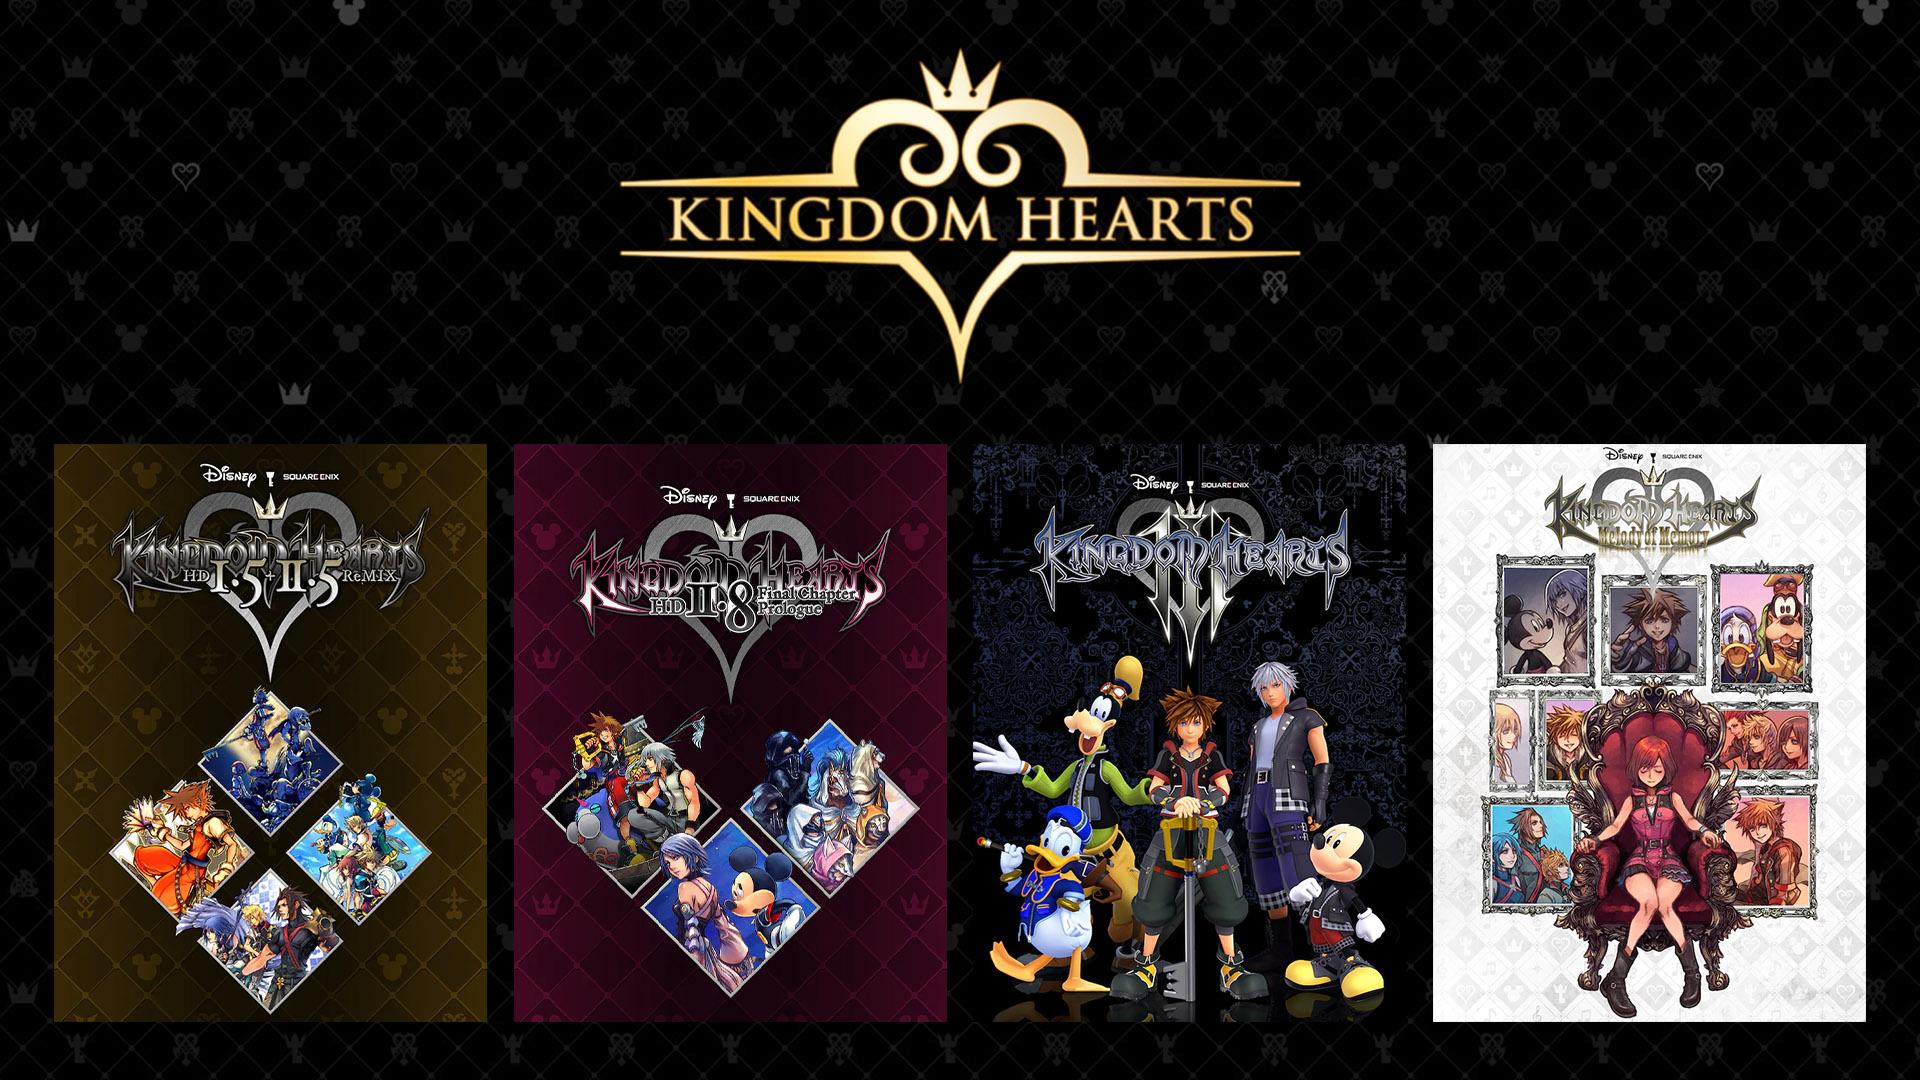 Kingdom Hearts 1320221 1